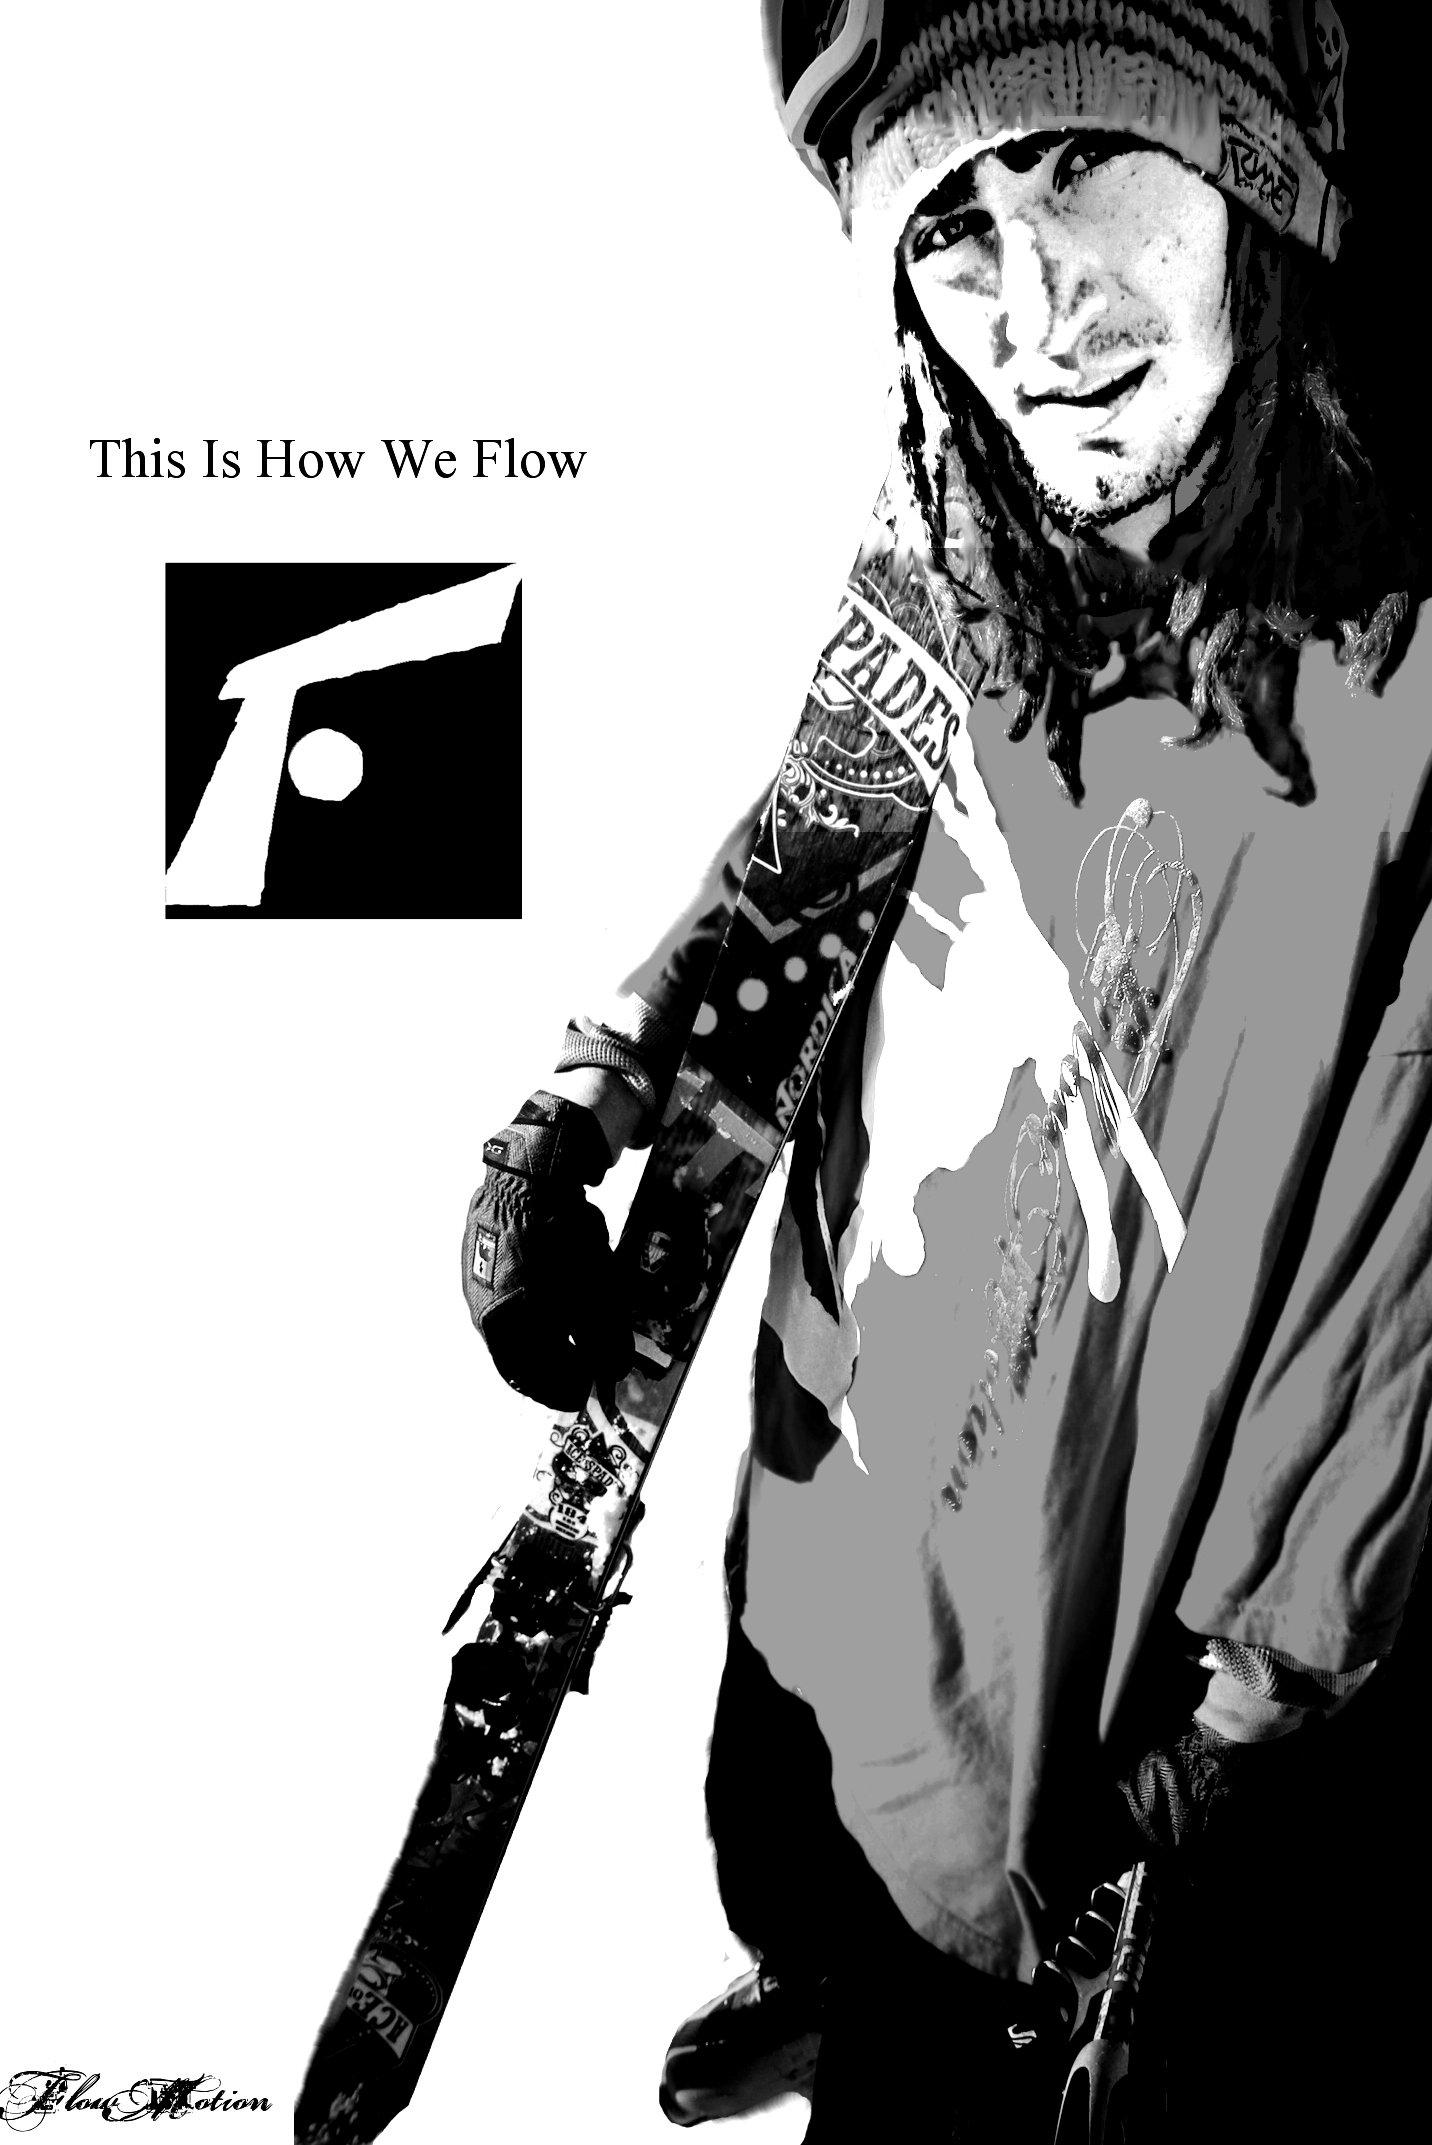 John Spriggs FlowMotion